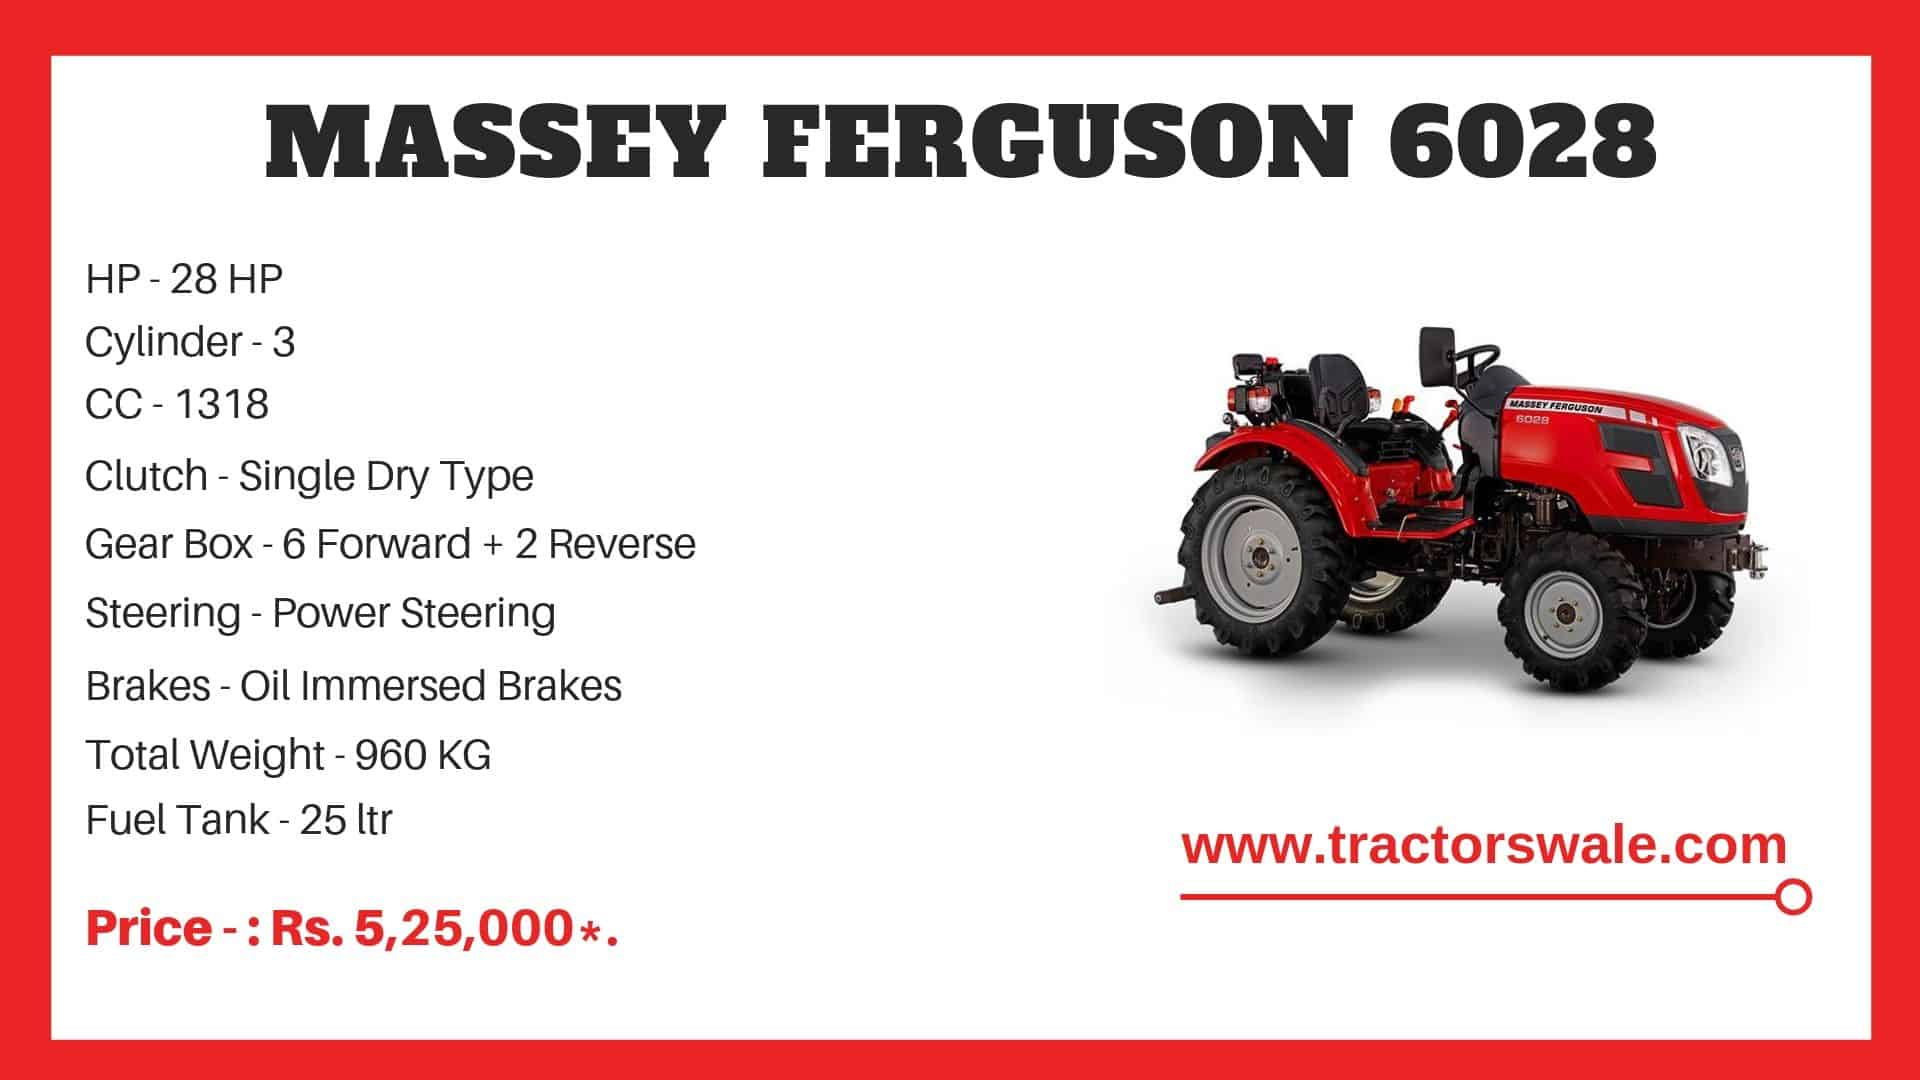 Specifications Of Massey Ferguson 6028